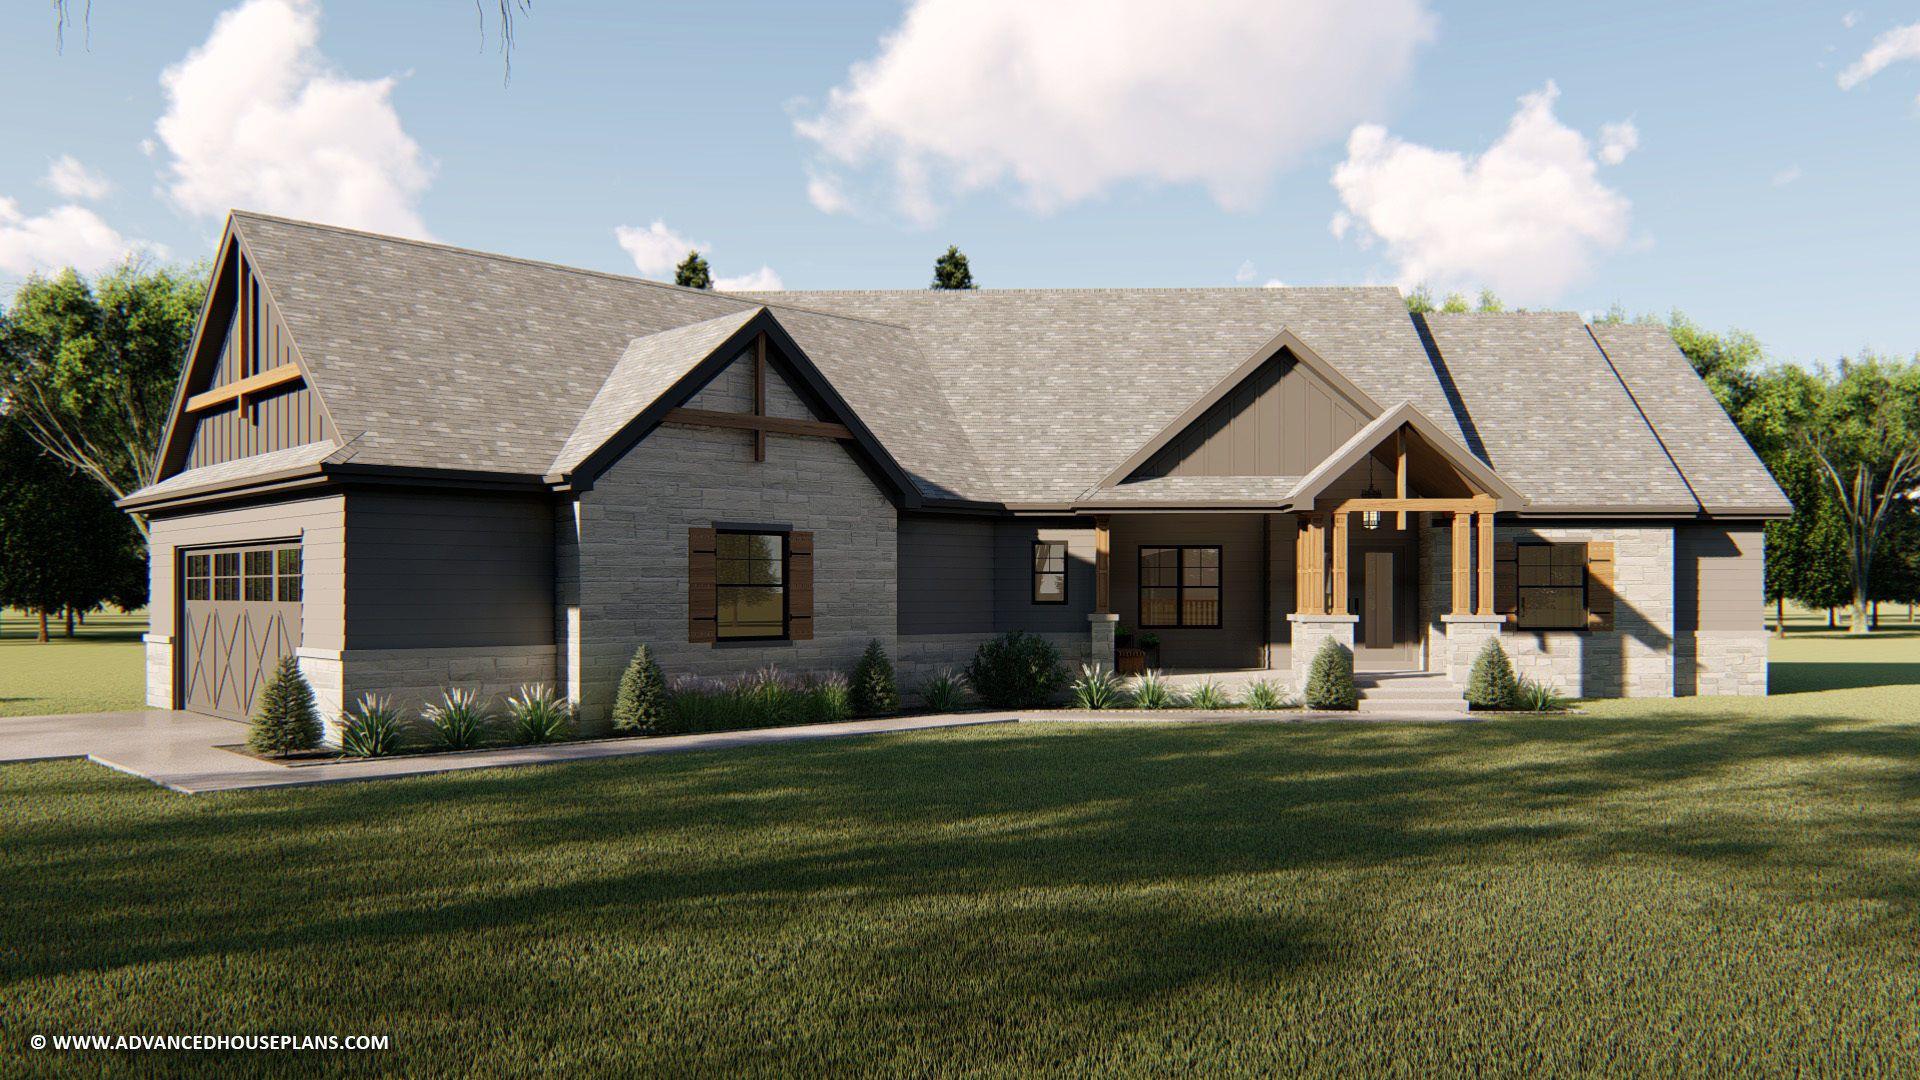 1 Story Craftsman House Plan Marietta Craftsman House Plans Craftsman Style House Plans Craftsman House